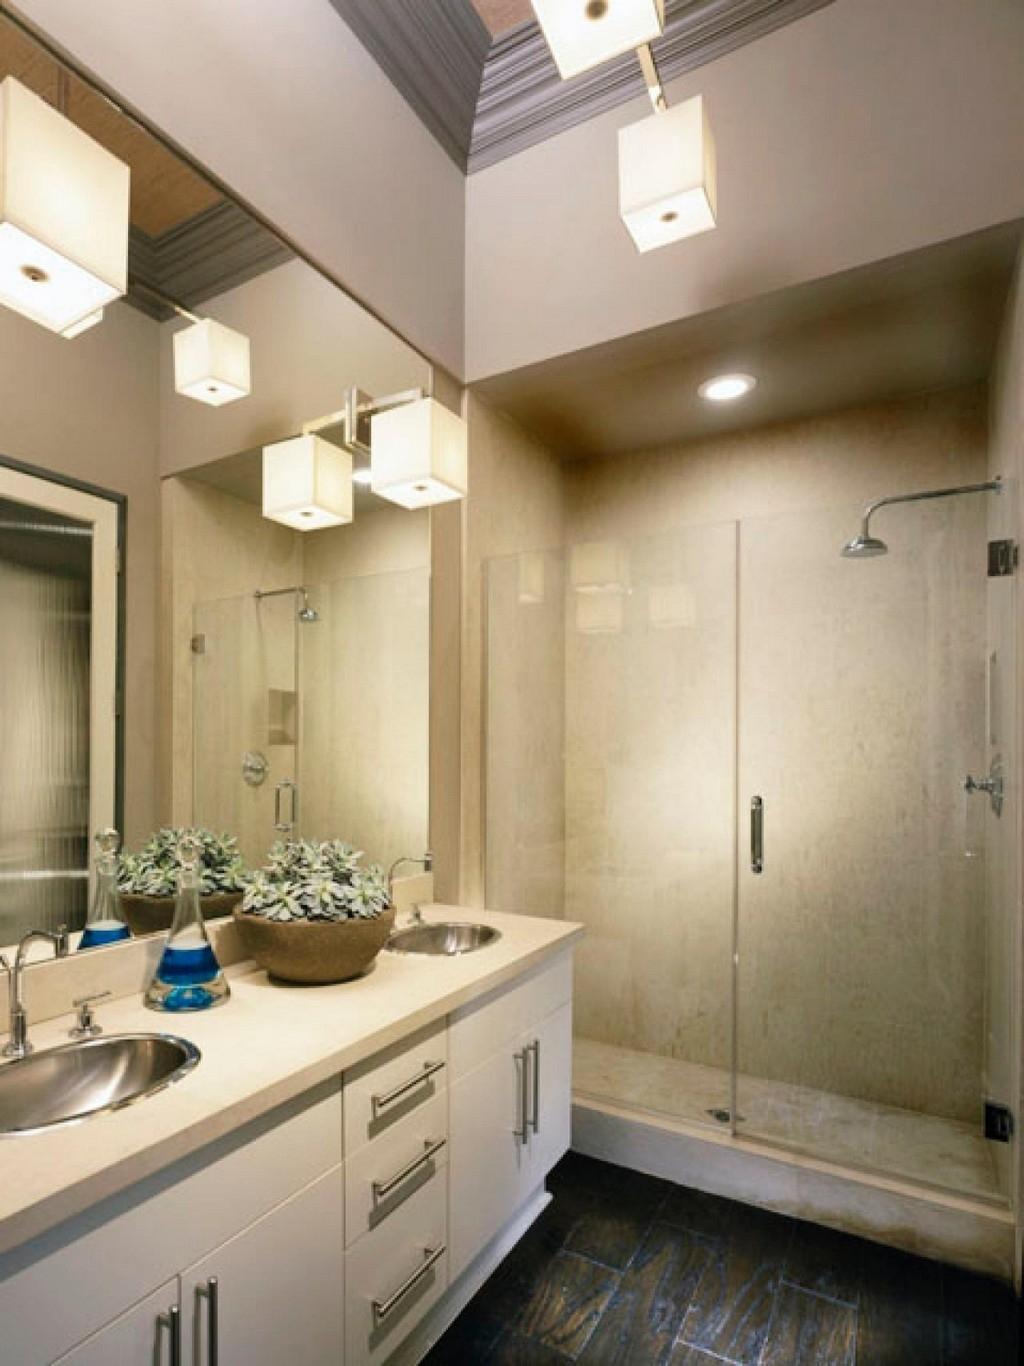 Bathroom Lighting With Matching Chandeliers Regarding Most Recent Chandeliers Design Wonderfulathroom Lights Hanging Ceiling Lighting (View 17 of 20)